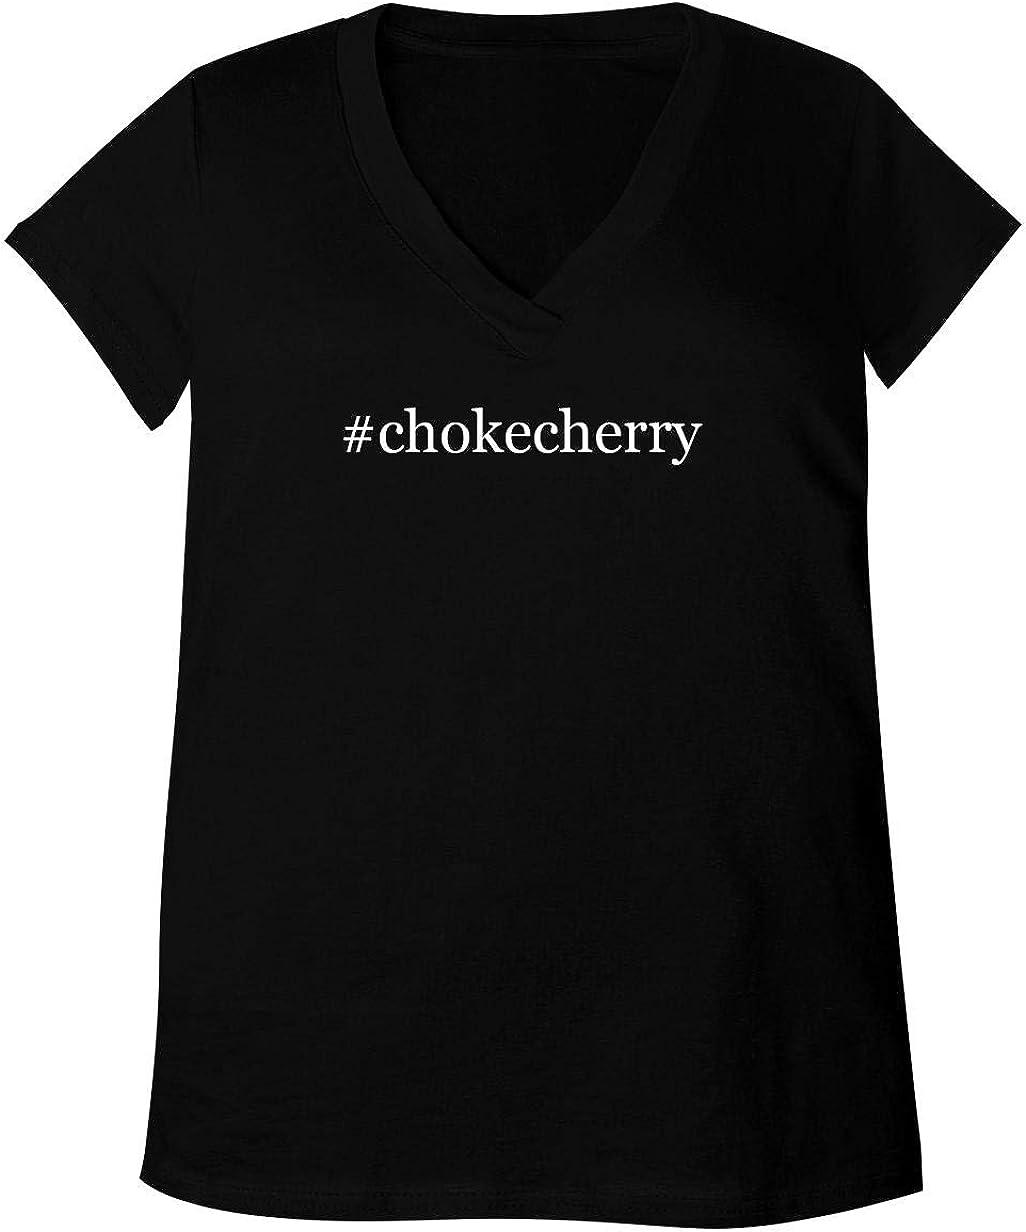 #Chokecherry - Adult Bella + Canvas B6035 Women's V-Neck T-Shirt 51tONFmhEEL